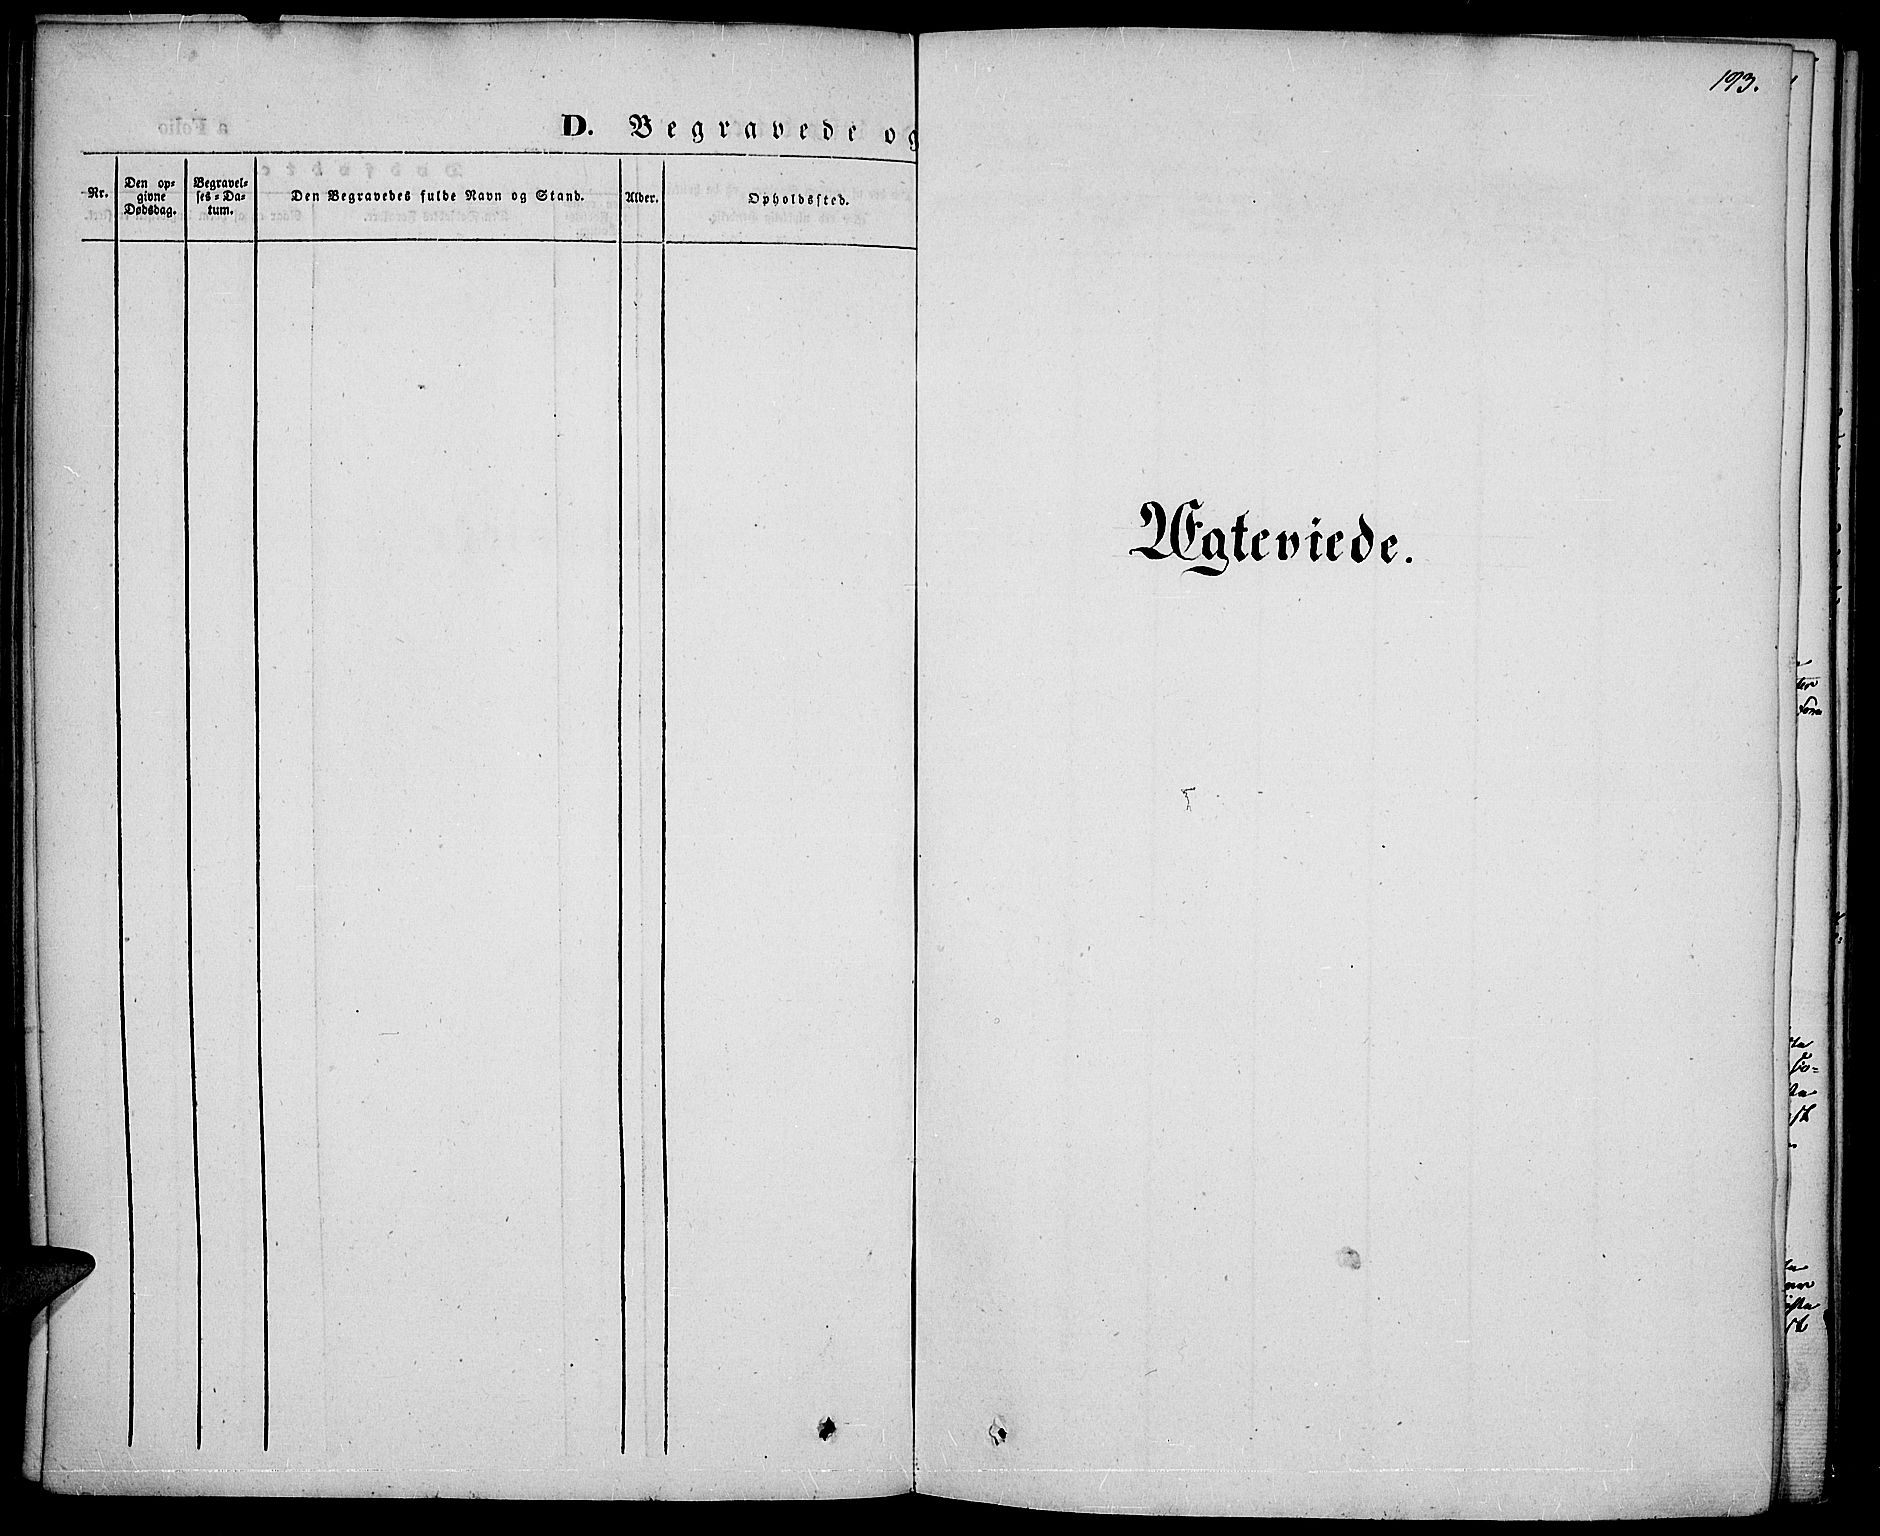 SAH, Vestre Toten prestekontor, H/Ha/Haa/L0004: Ministerialbok nr. 4, 1844-1849, s. 193